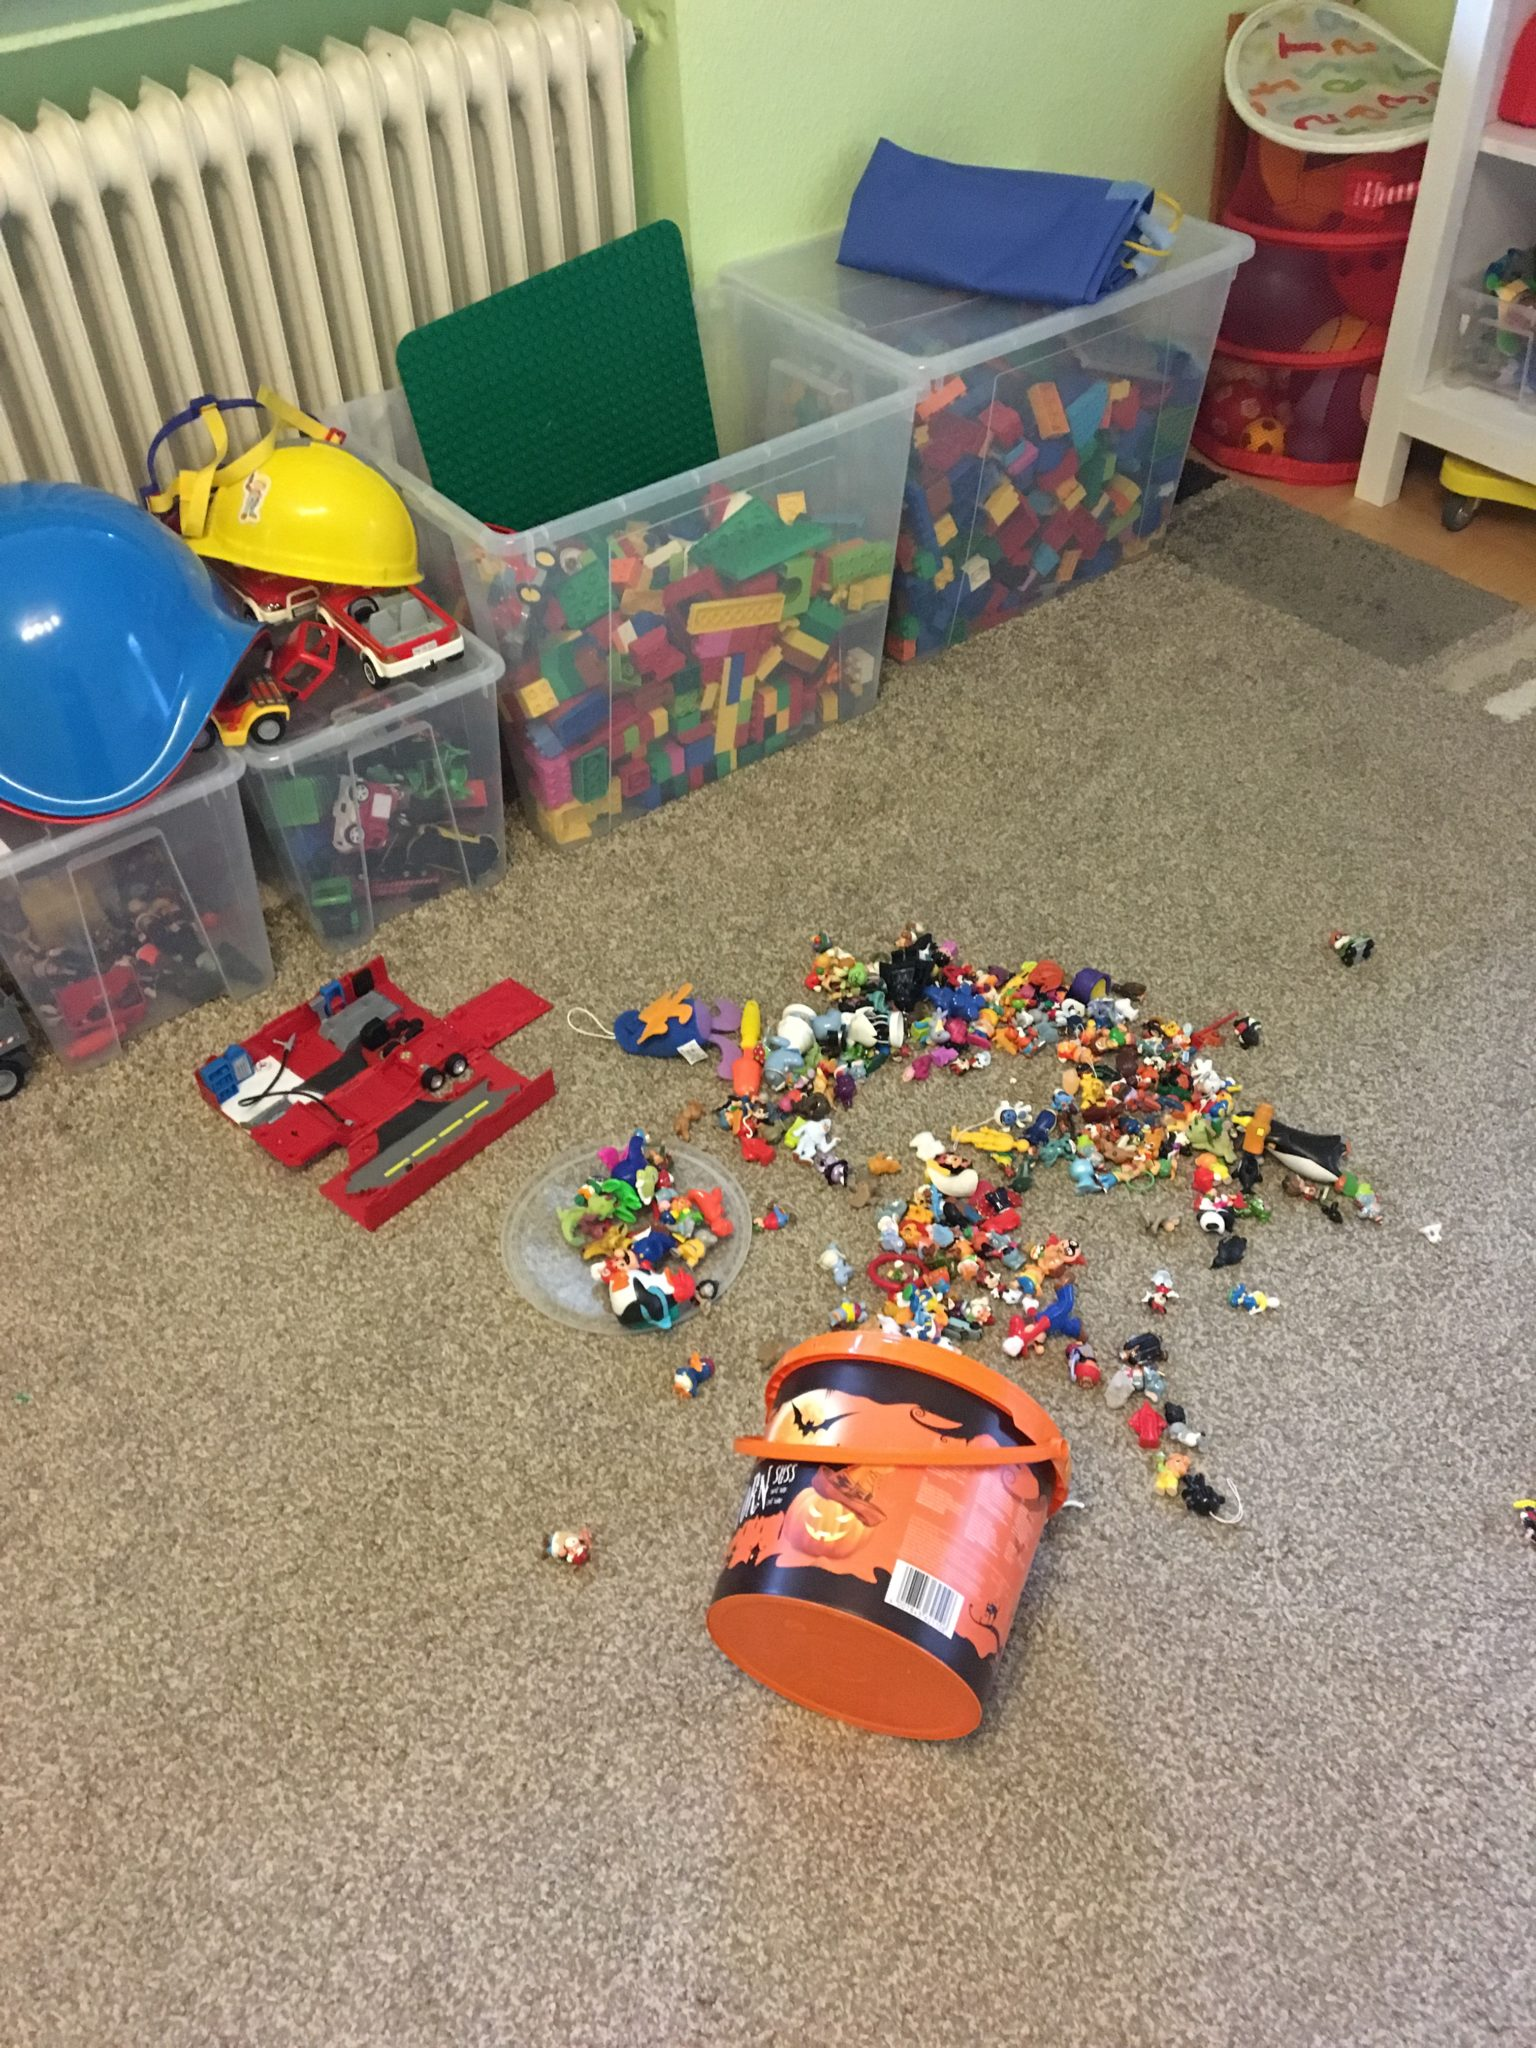 Kinderzimmer/tagaustagein